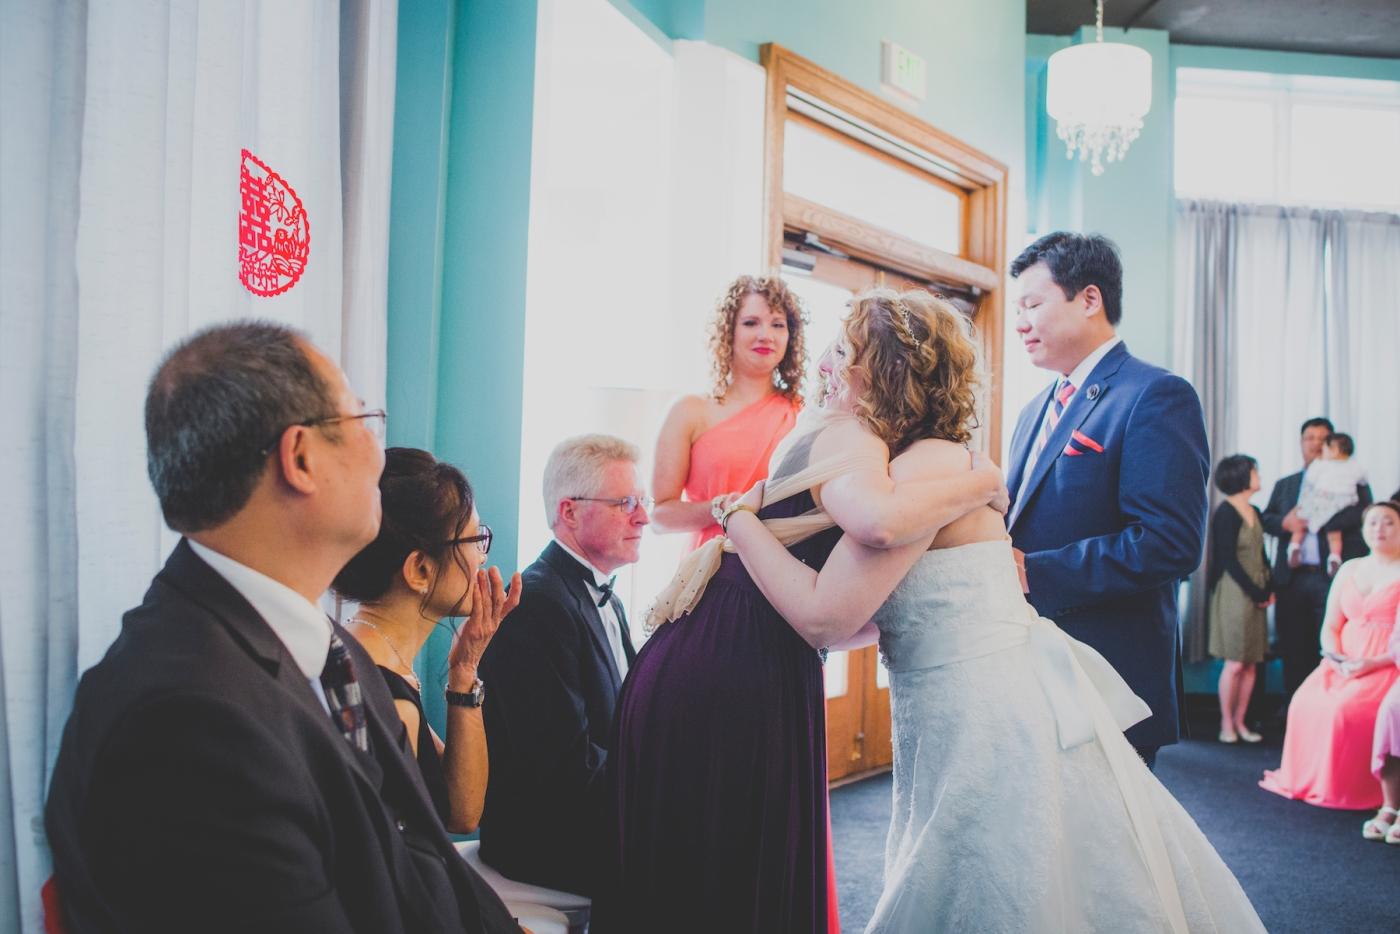 DSC_3008Everett_Wedding_Ballroom_Jane_Speleers_photography_Rachel_and_Edmund_teaceremony_2017